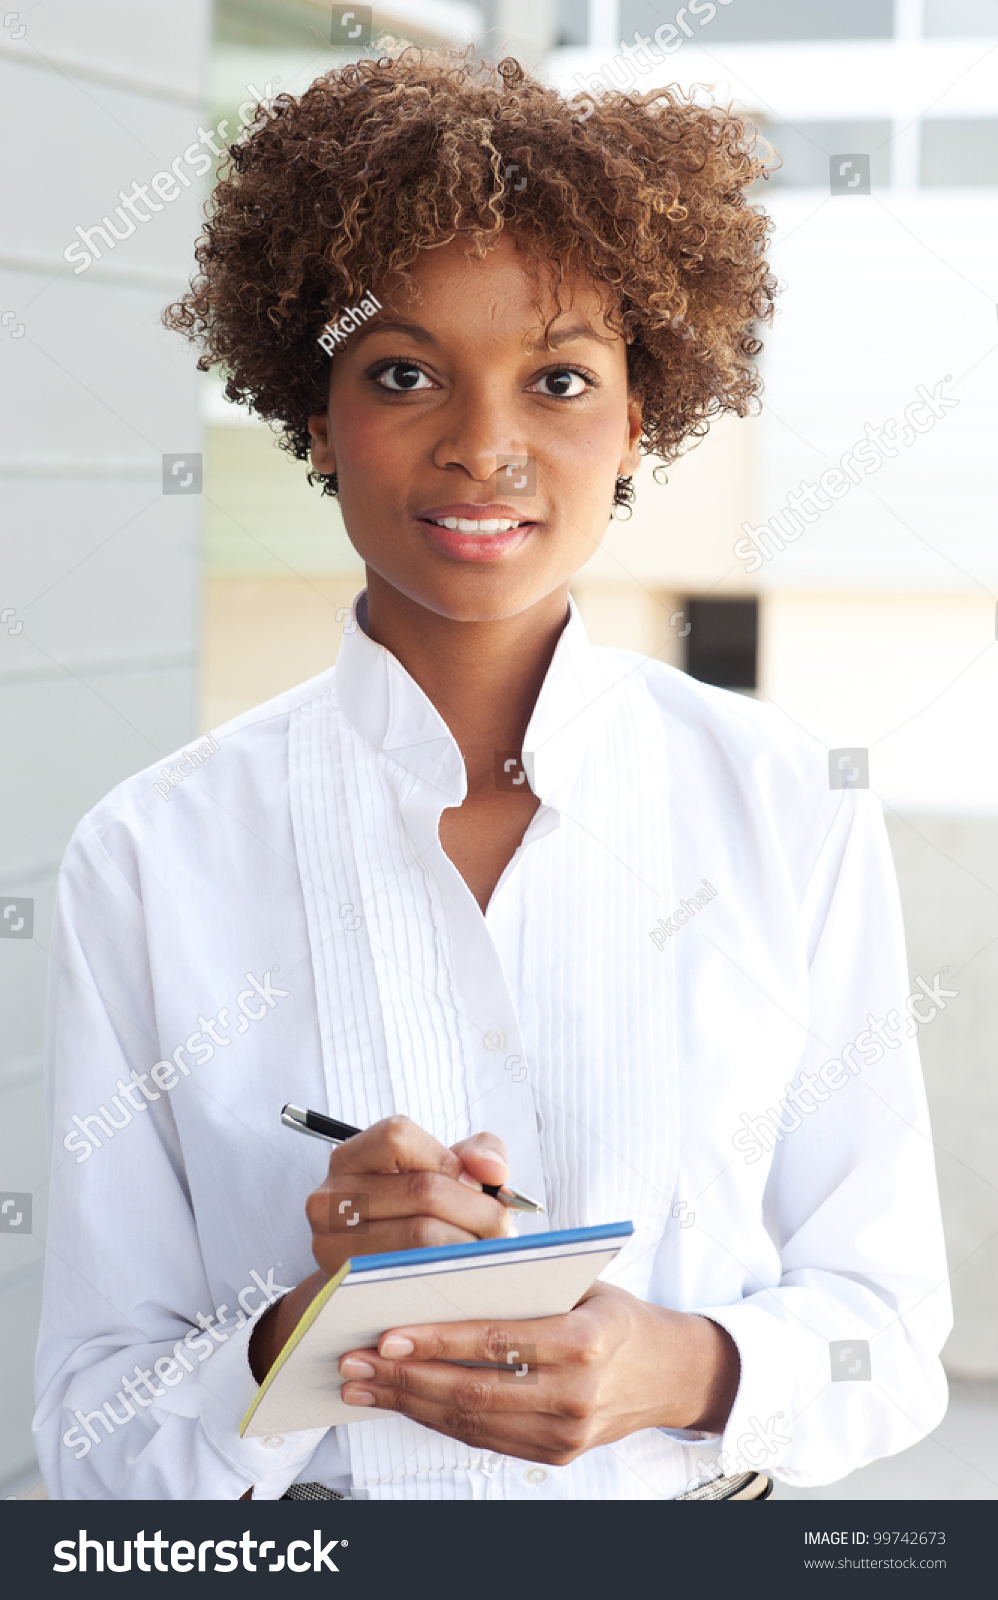 african americans progression essay